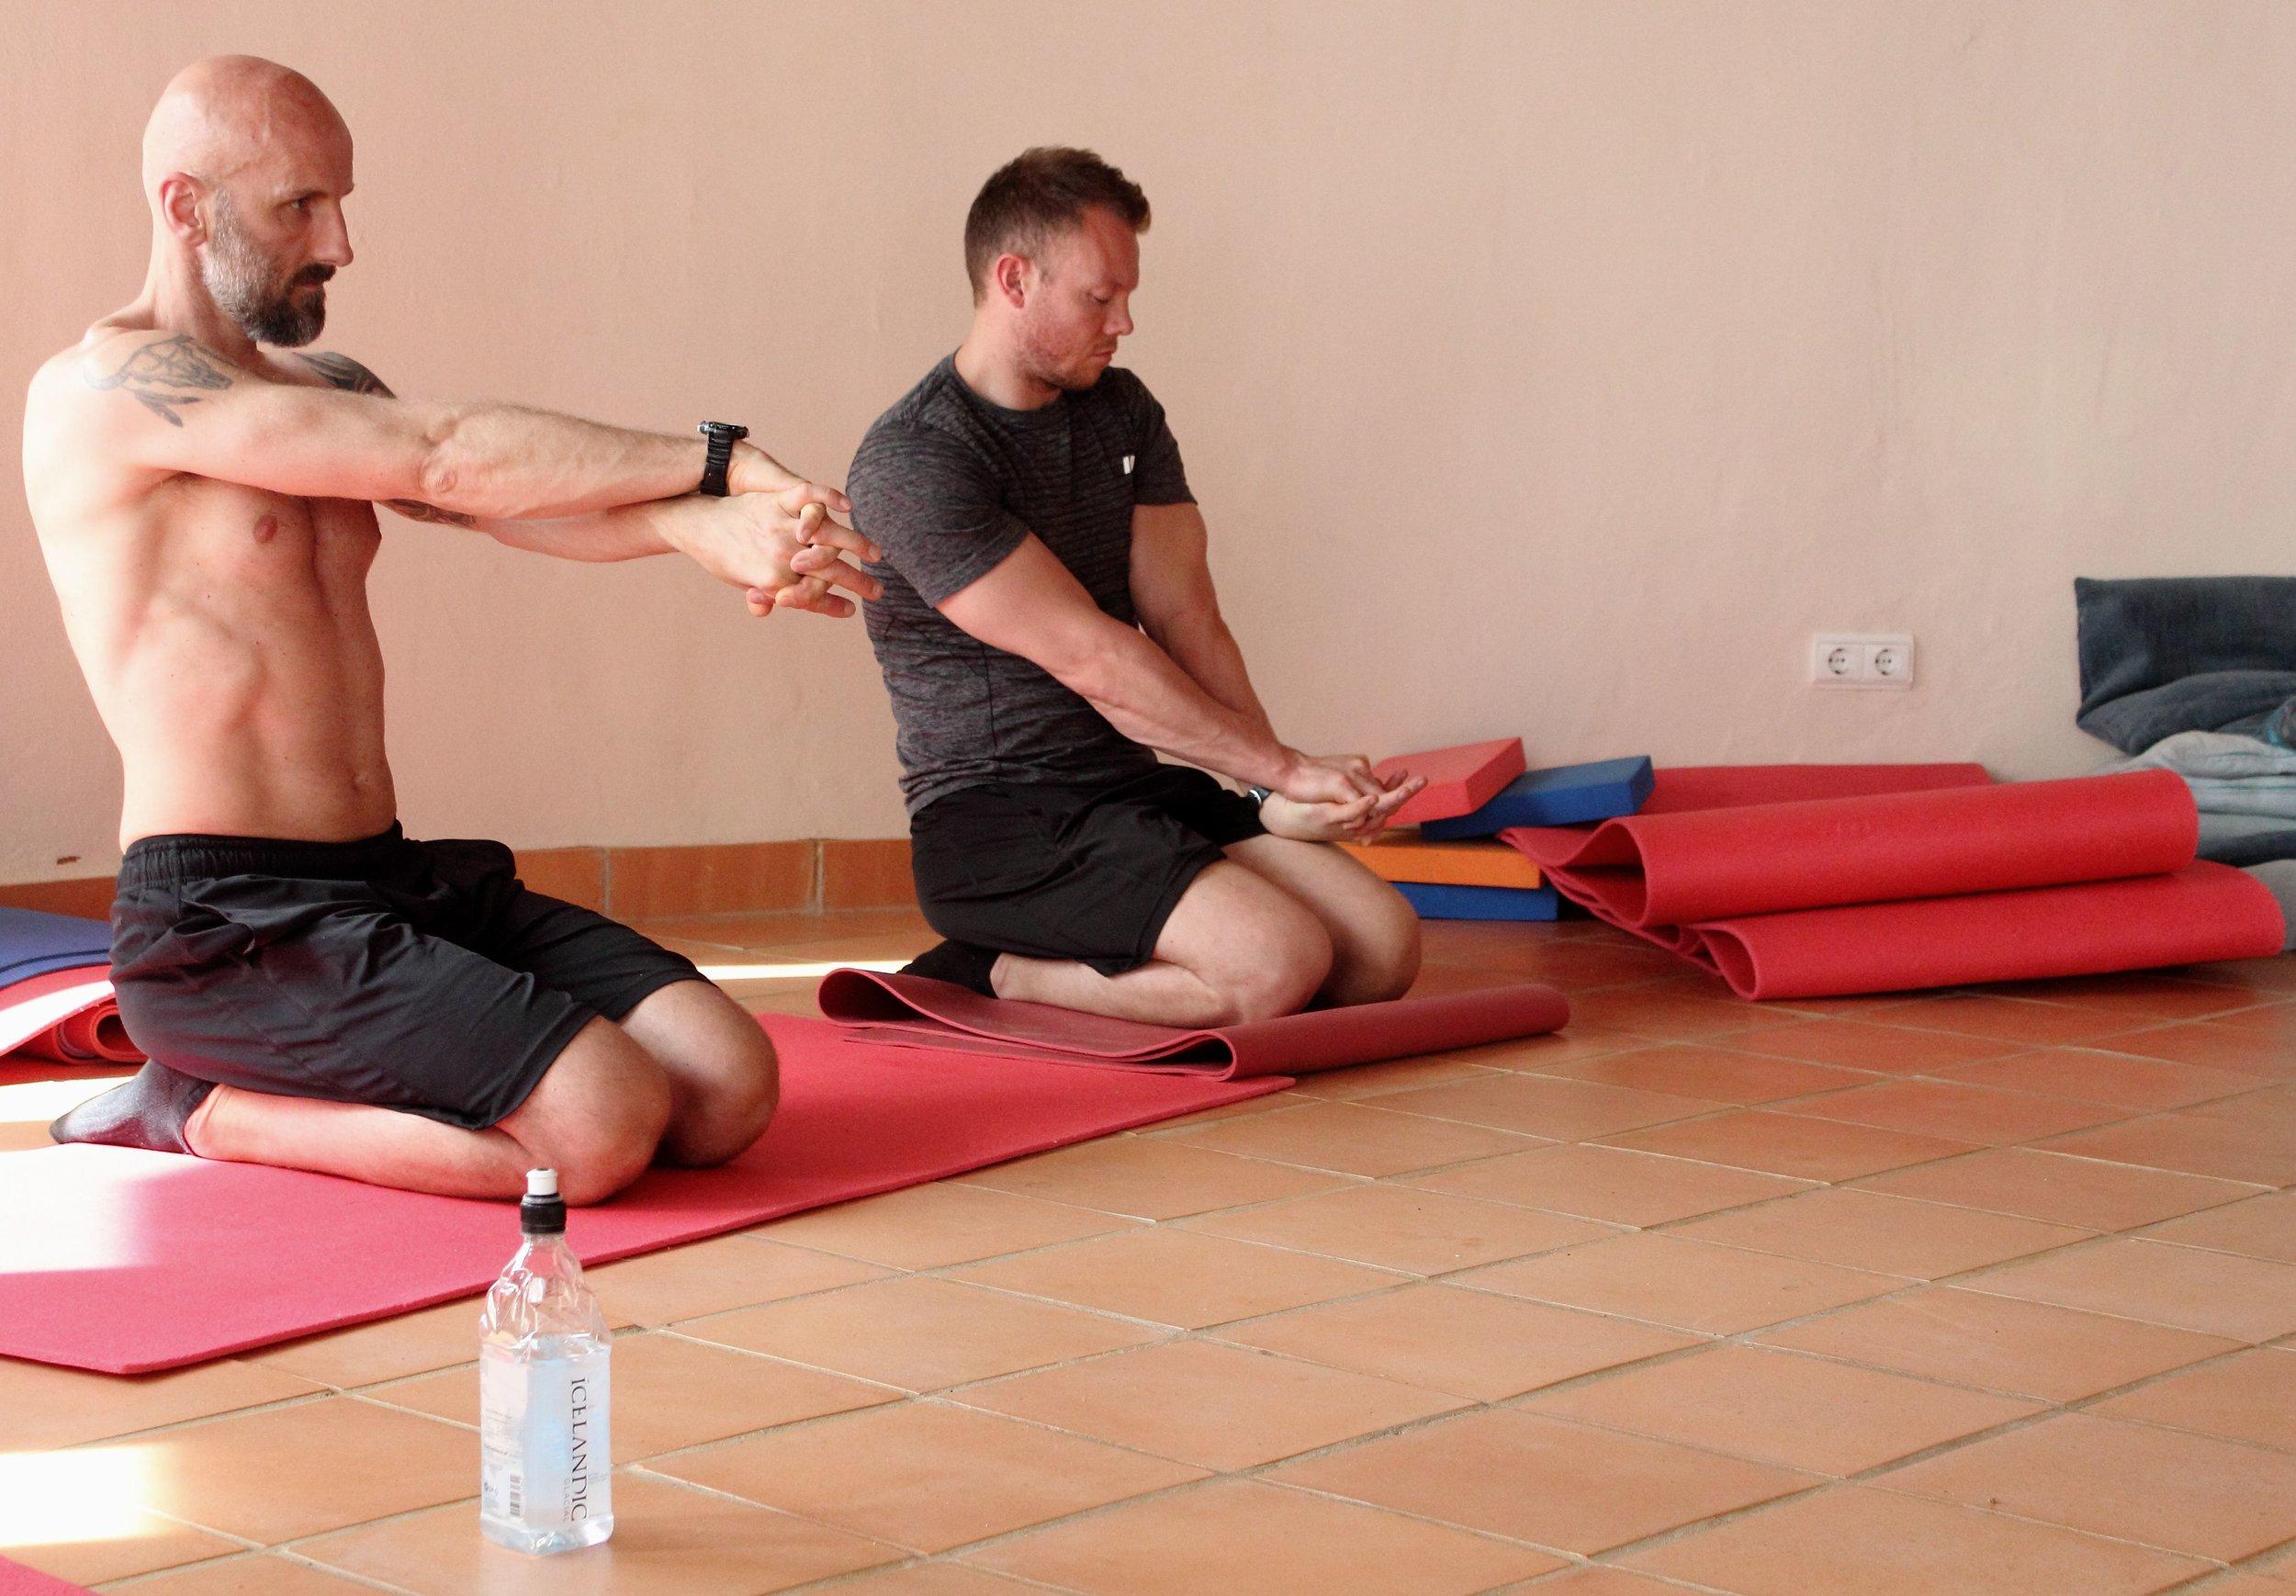 Inertia Retreat Saturday Afternoon_Mikael Handbalancing_Seve_3.jpg